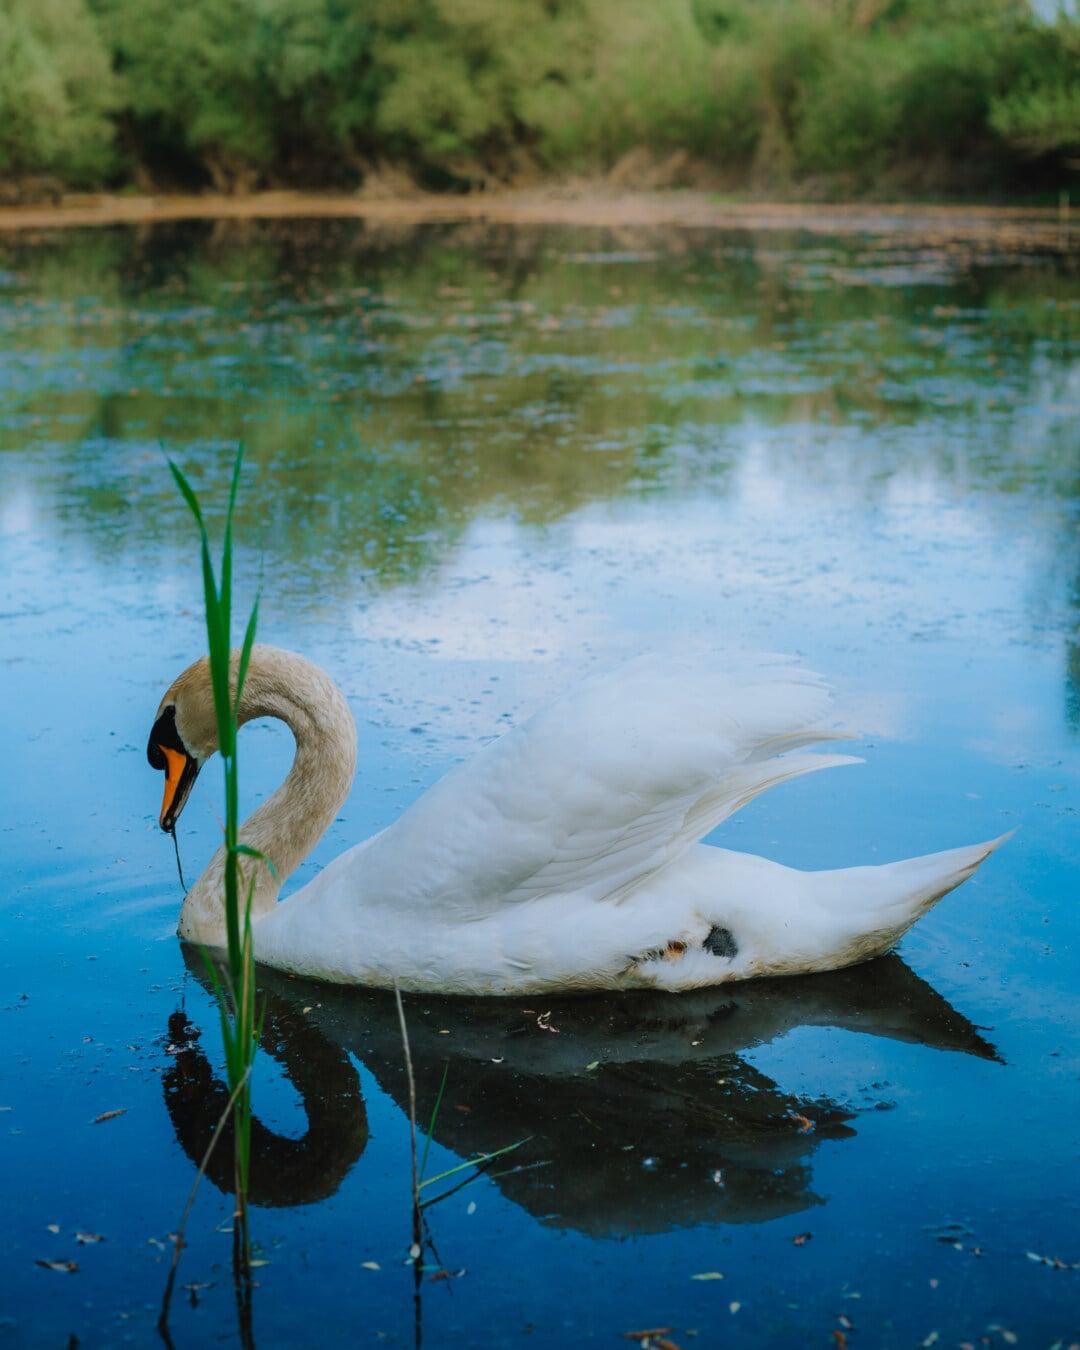 swan, majestic, grace, bird, side view, wading bird, reflection, heron, lake, water